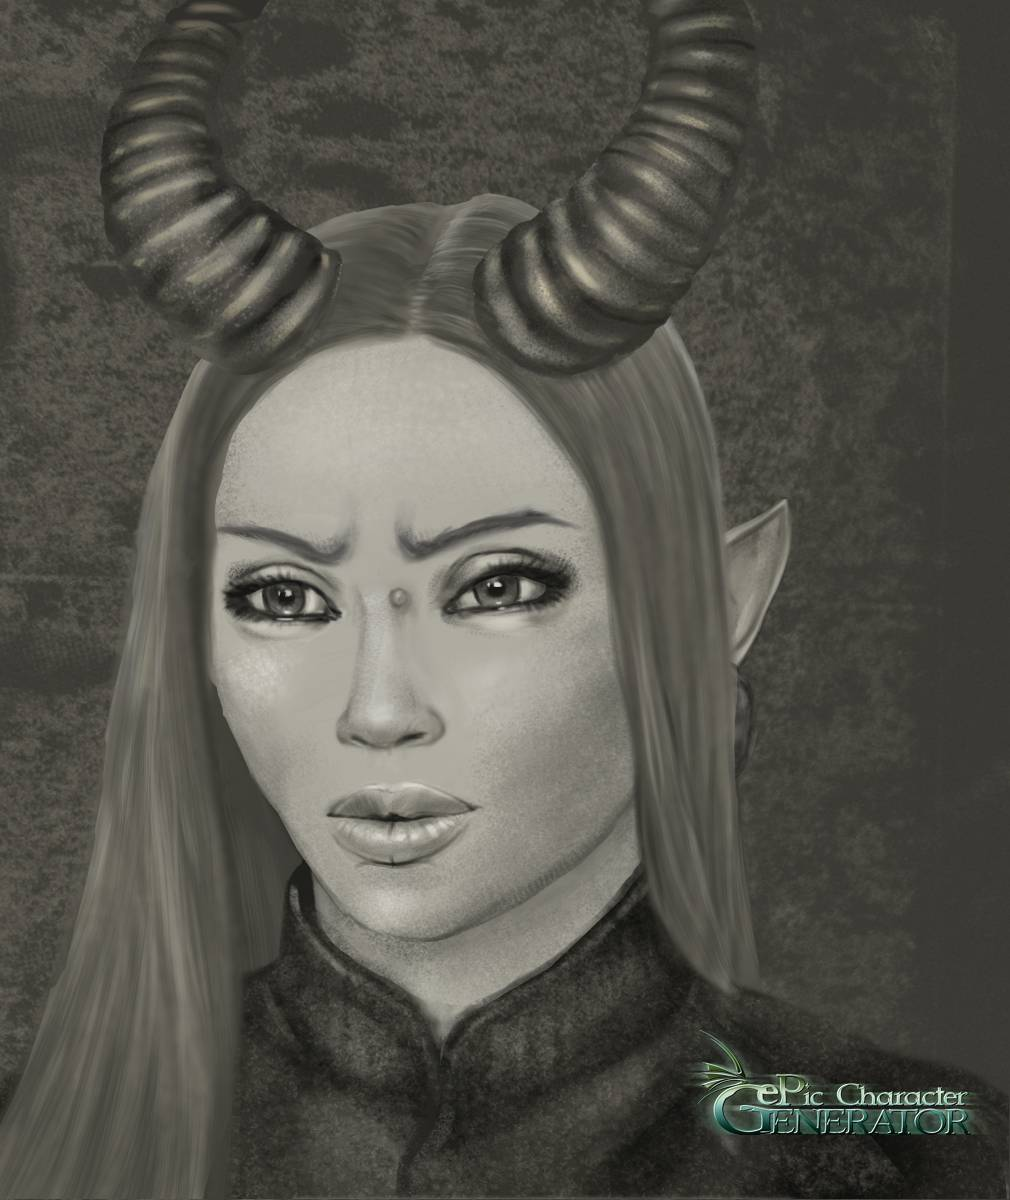 ePic Character Generator Season 3 Female Portrait Screenshot 13